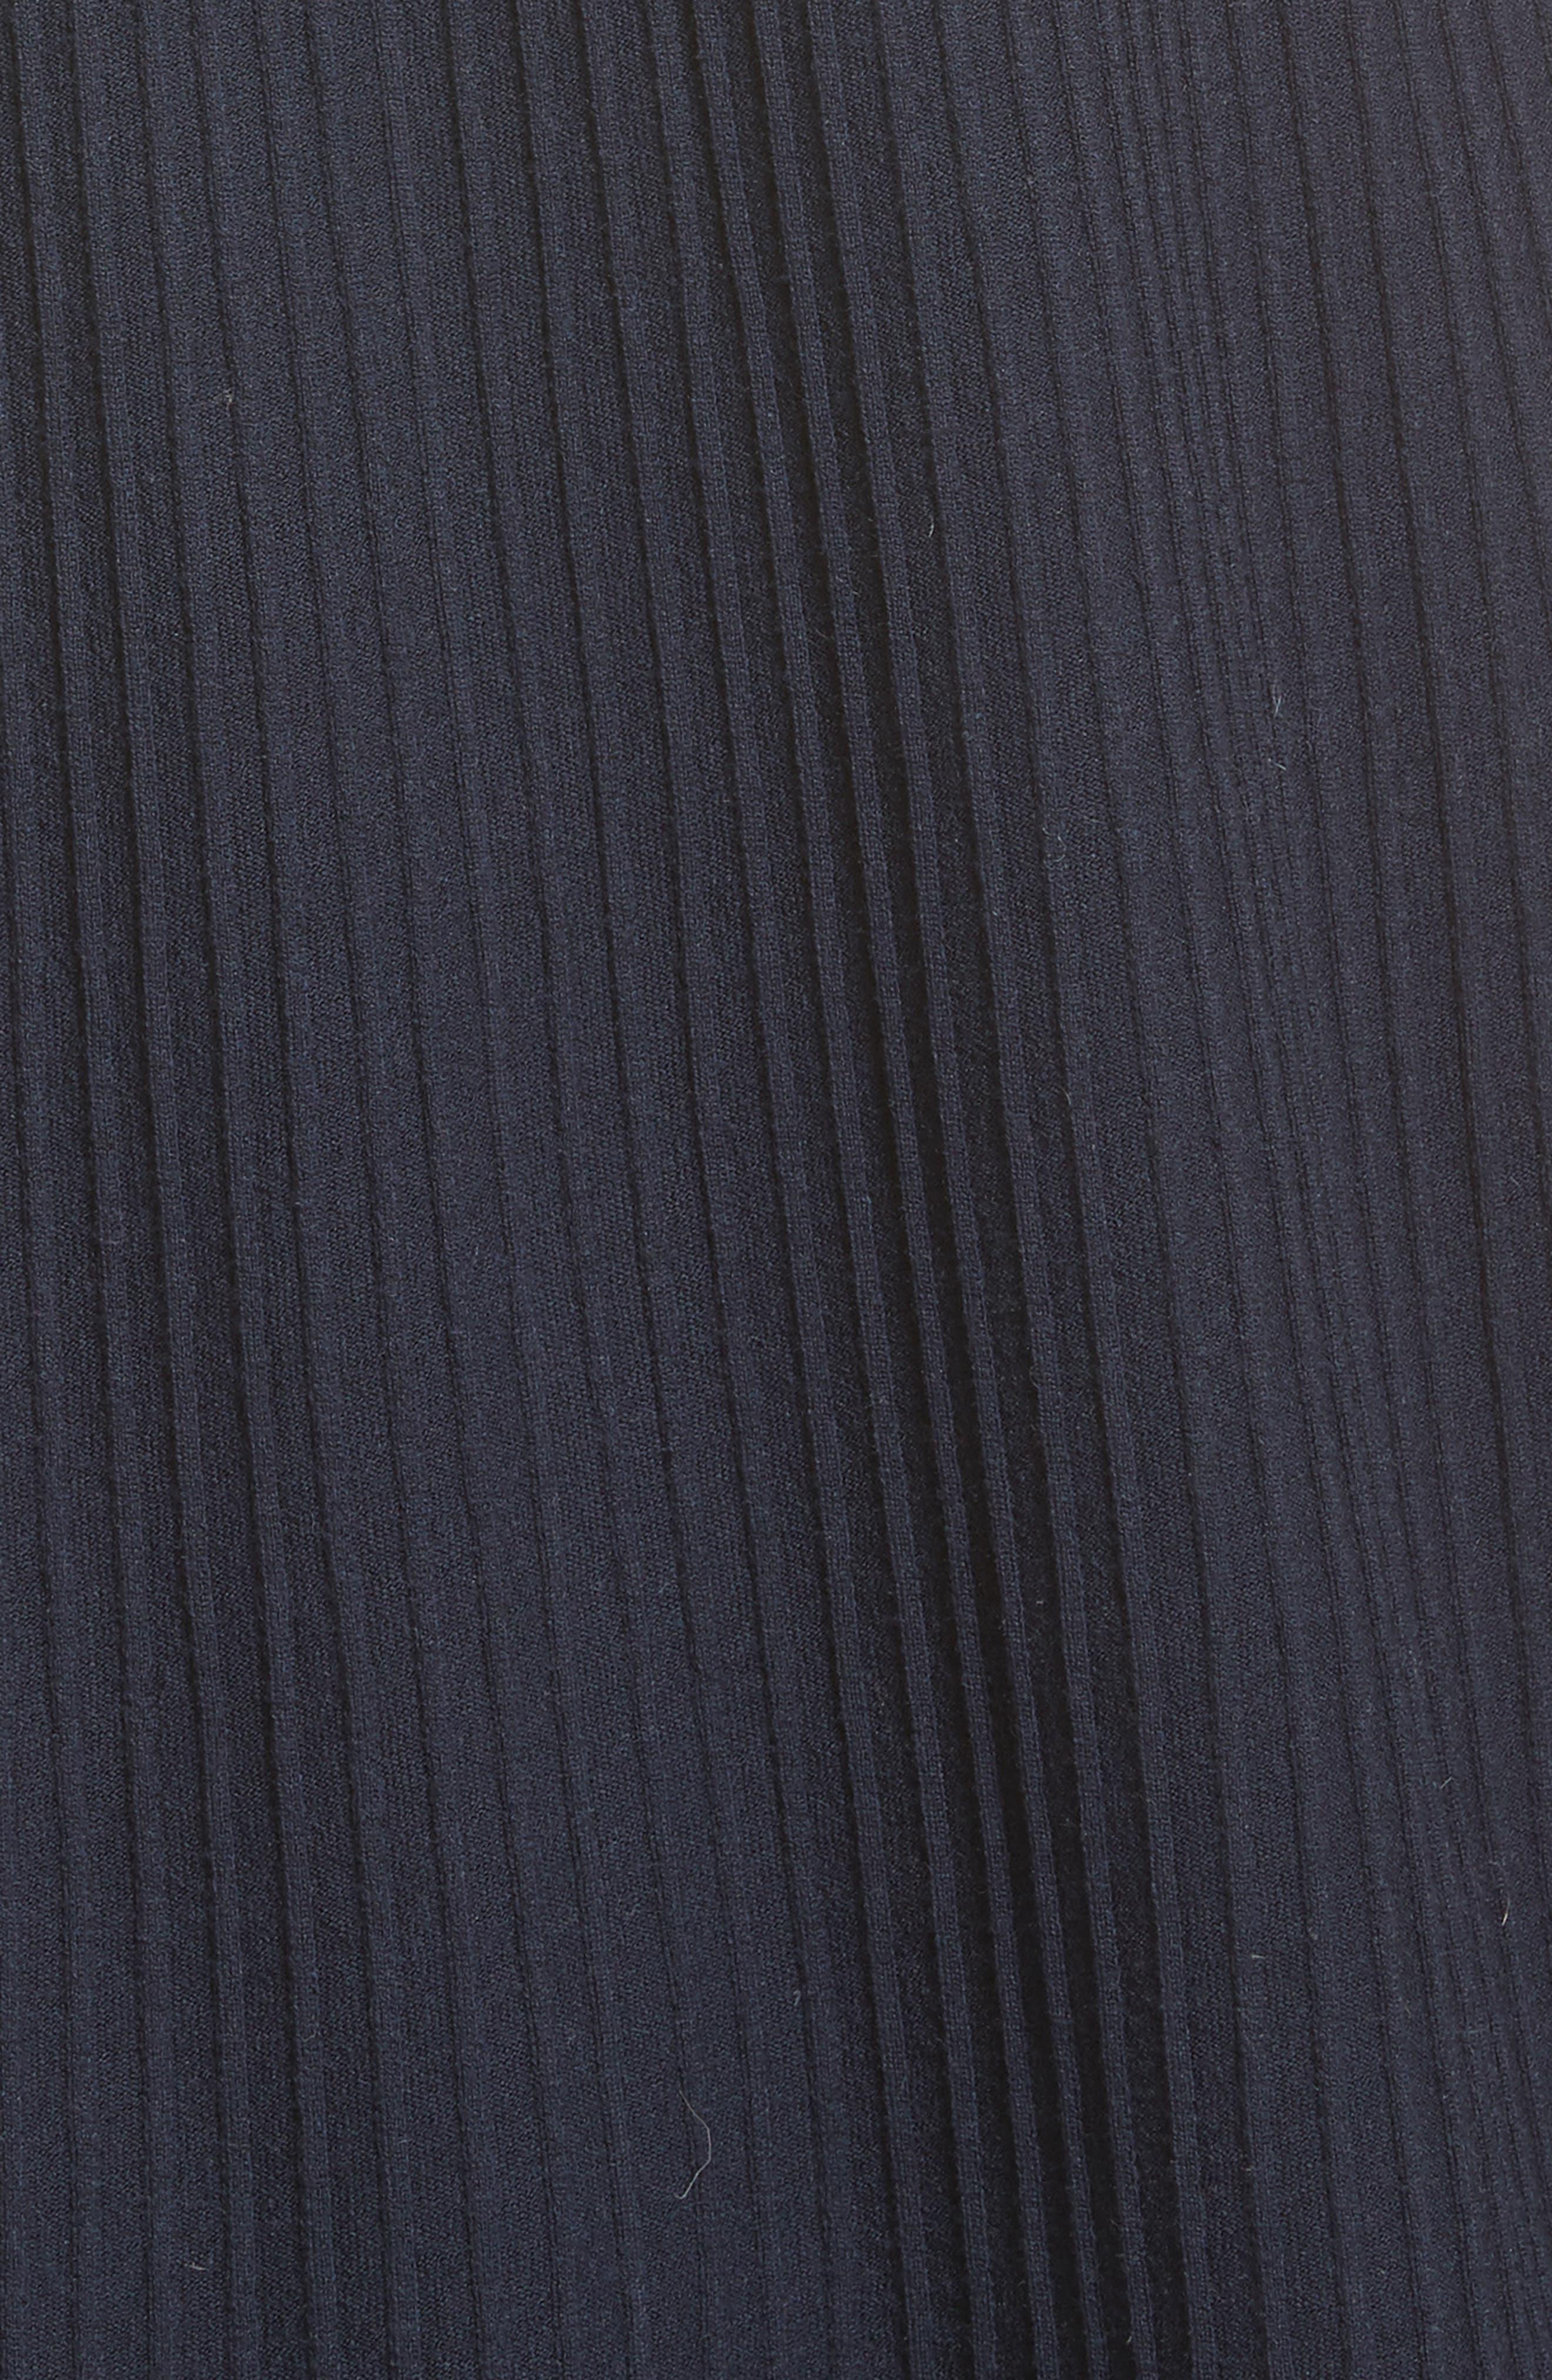 Josette Merino Wool Blend Apron Dress,                             Alternate thumbnail 5, color,                             Navy